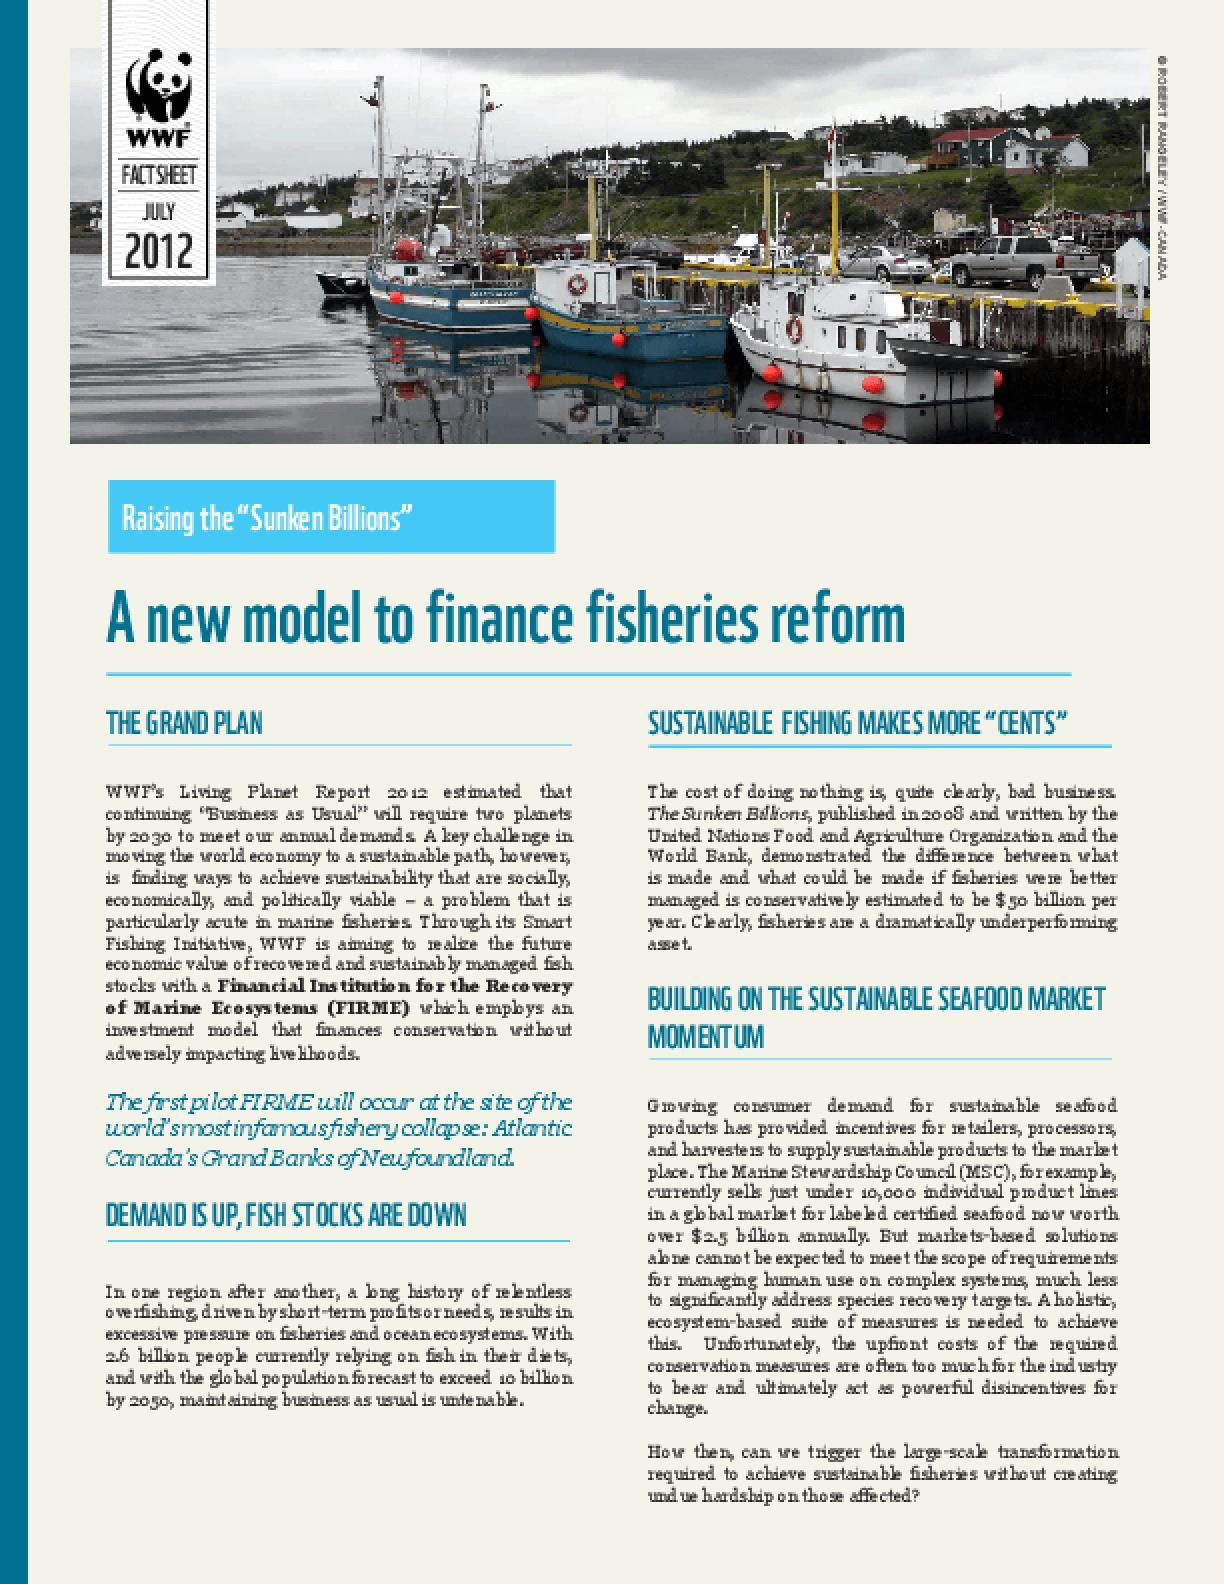 Raising the Sunken Billions: A New Model to Finance Fisheries Reform